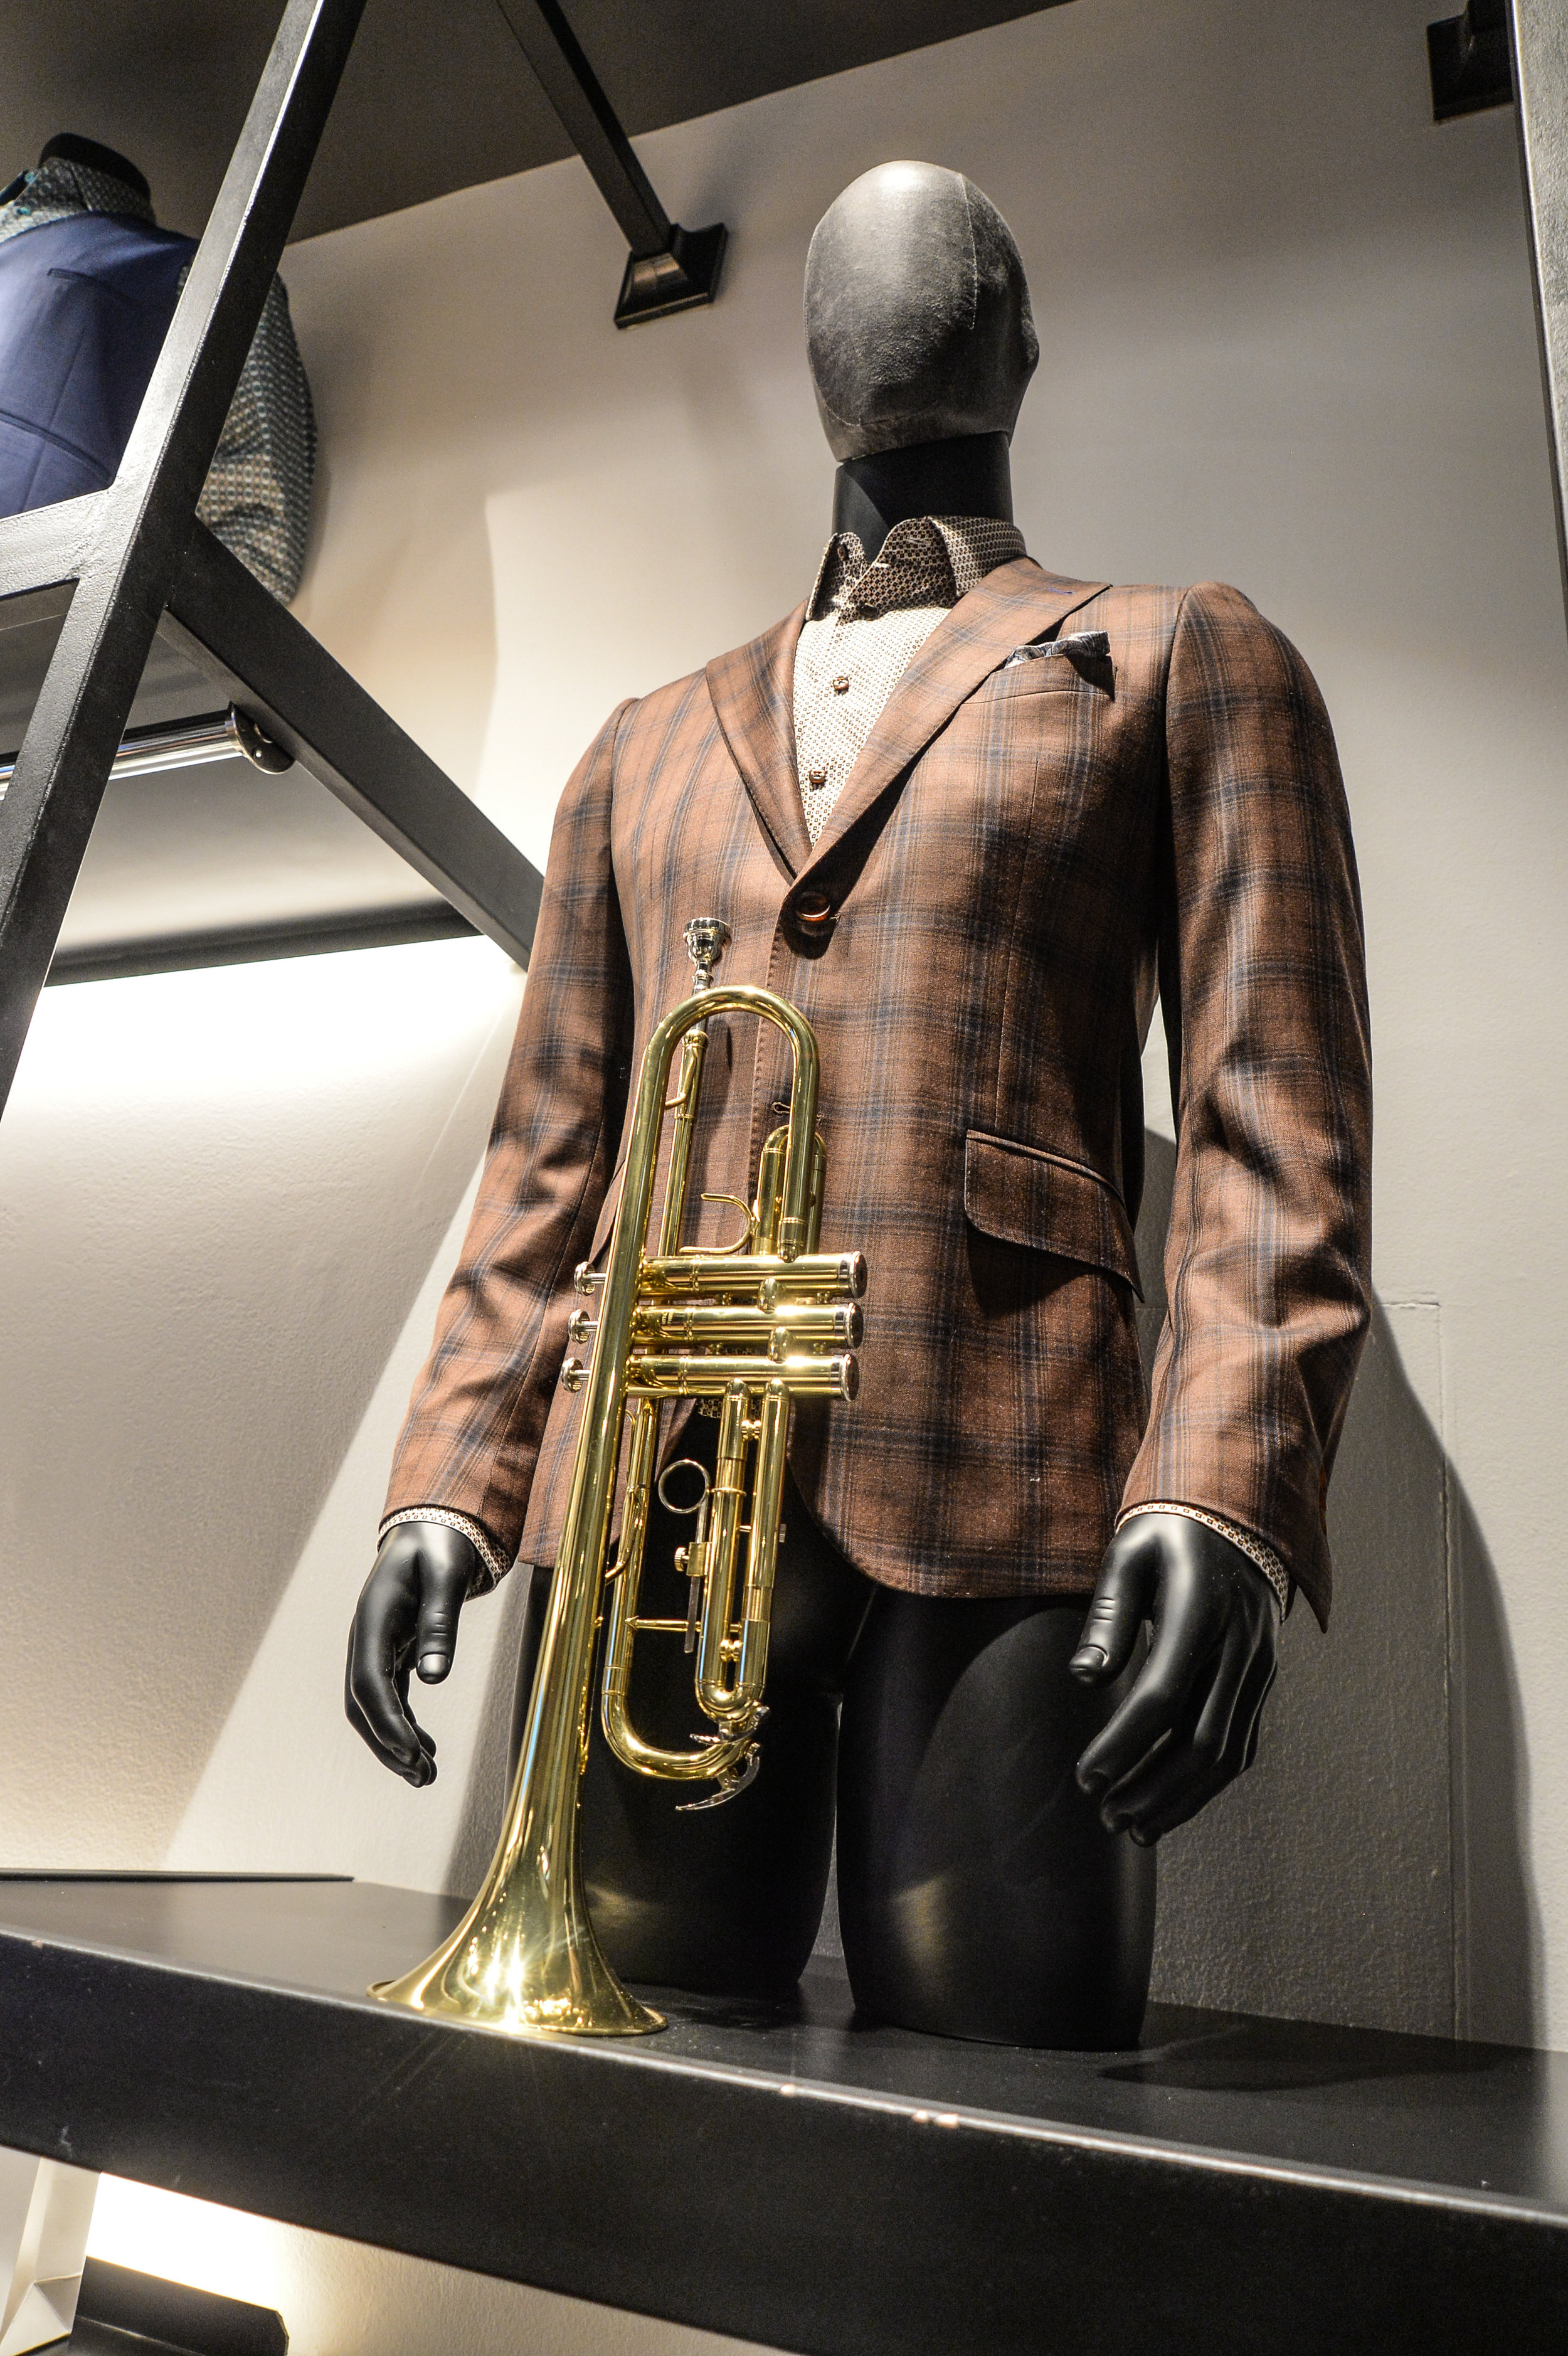 Sports Jacket by DCLA - Fabric by Loro Piana